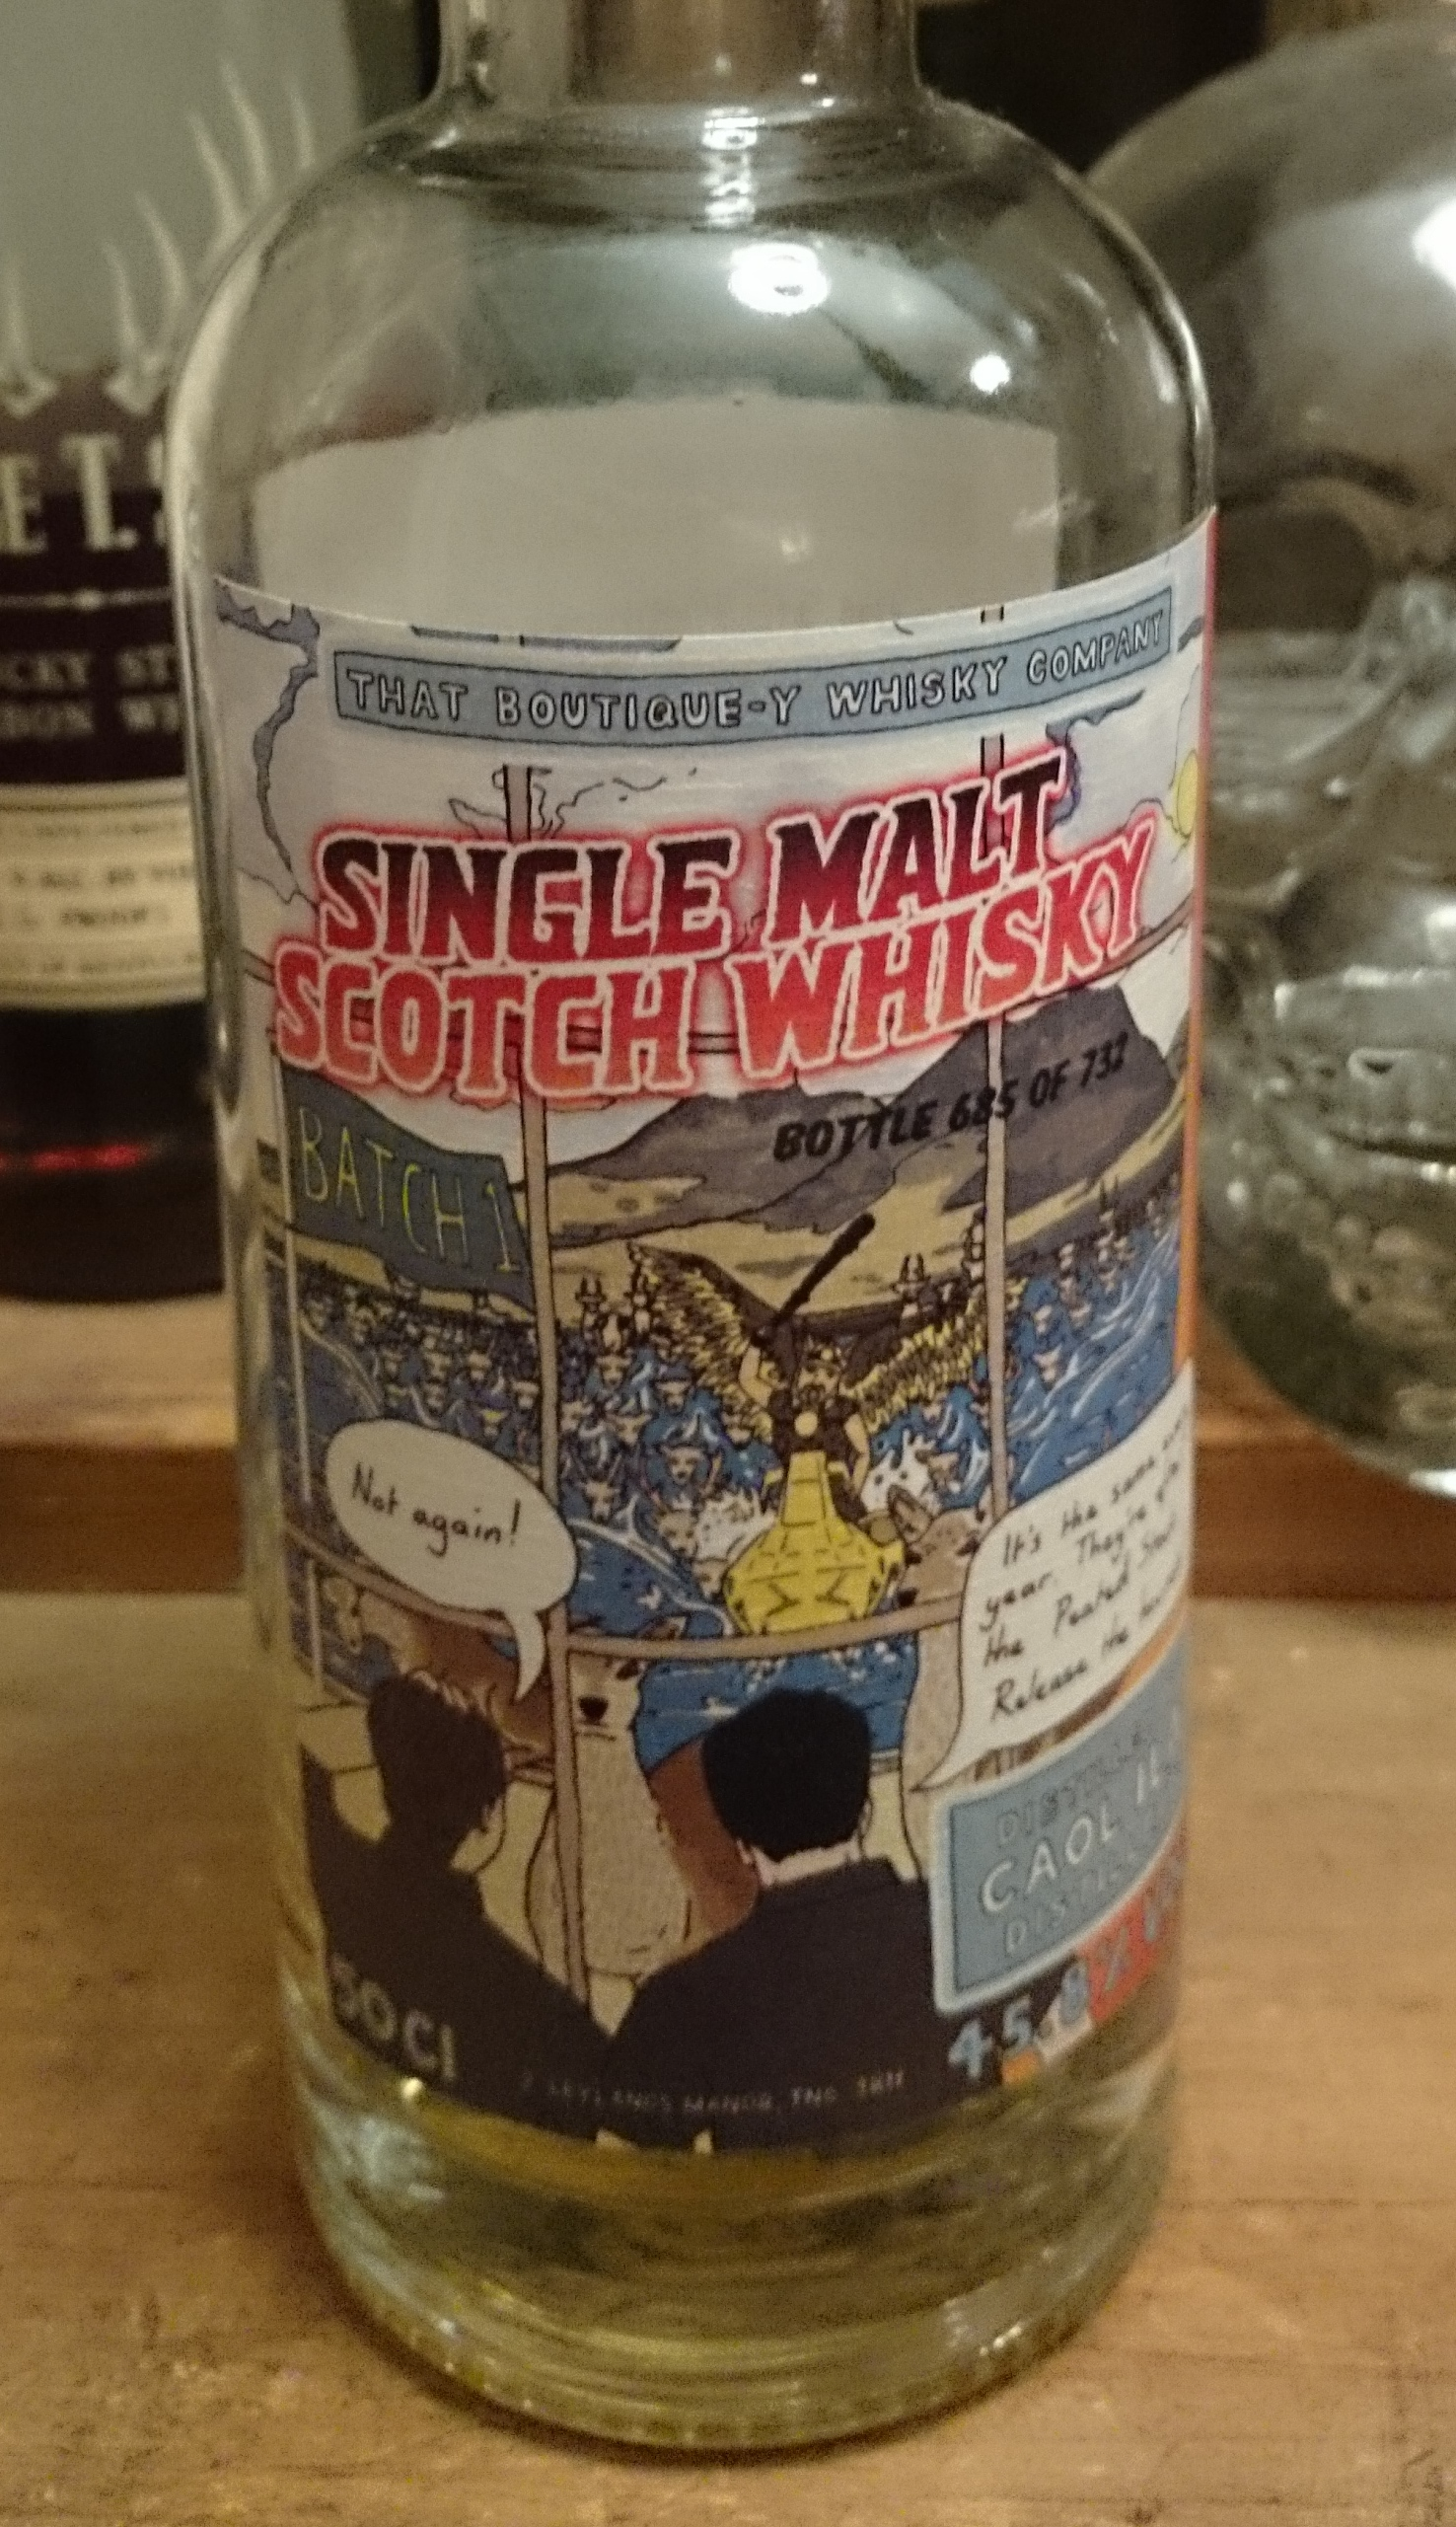 That Boutique-y Whisky Company - Caol Ila Batch 1